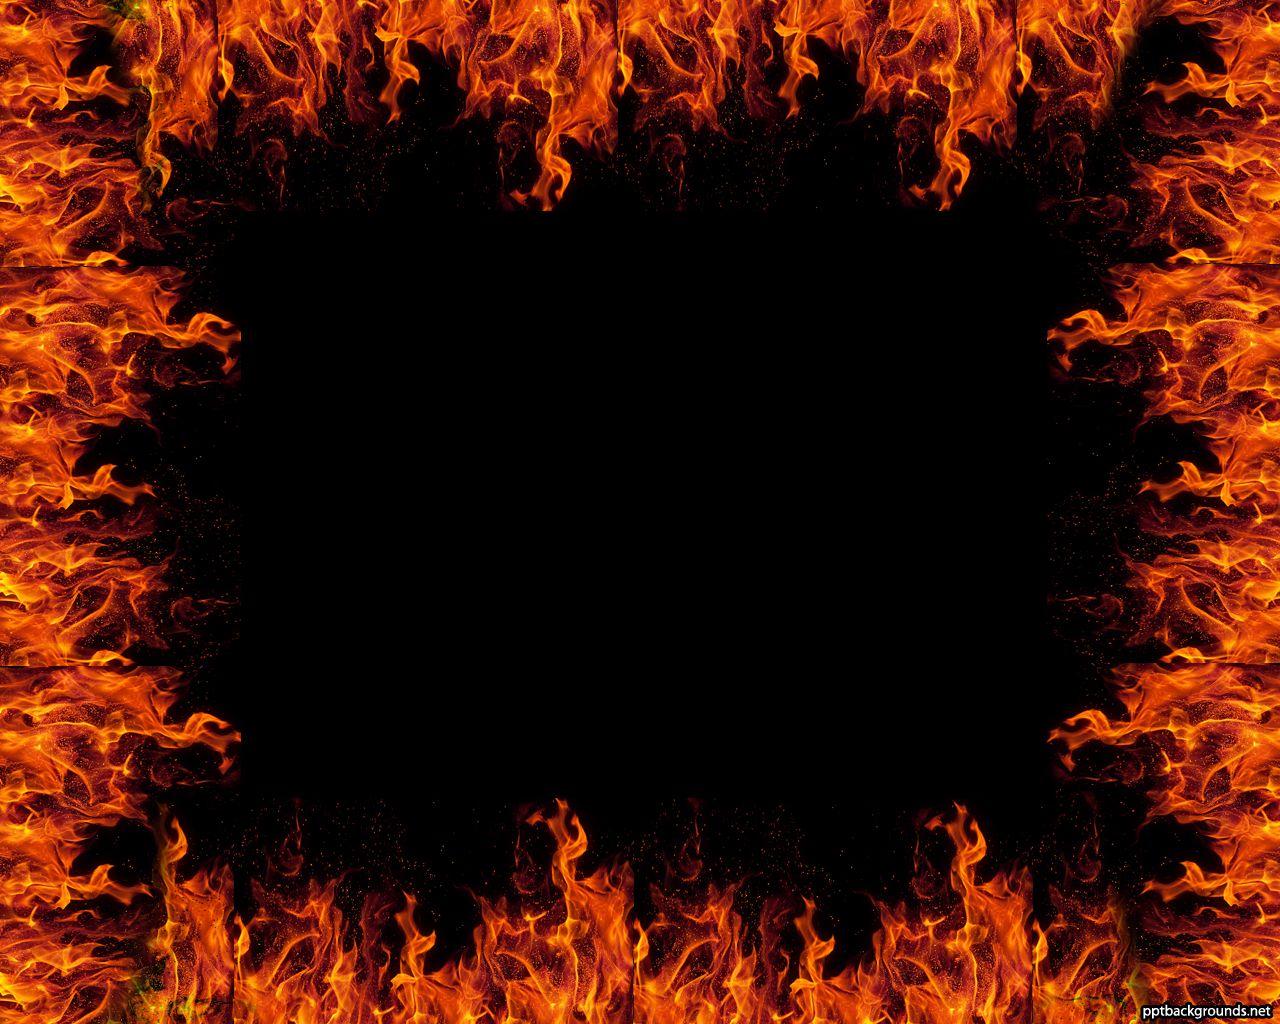 Fire Border with Flames   YAZI FONLARI 2   Pinterest